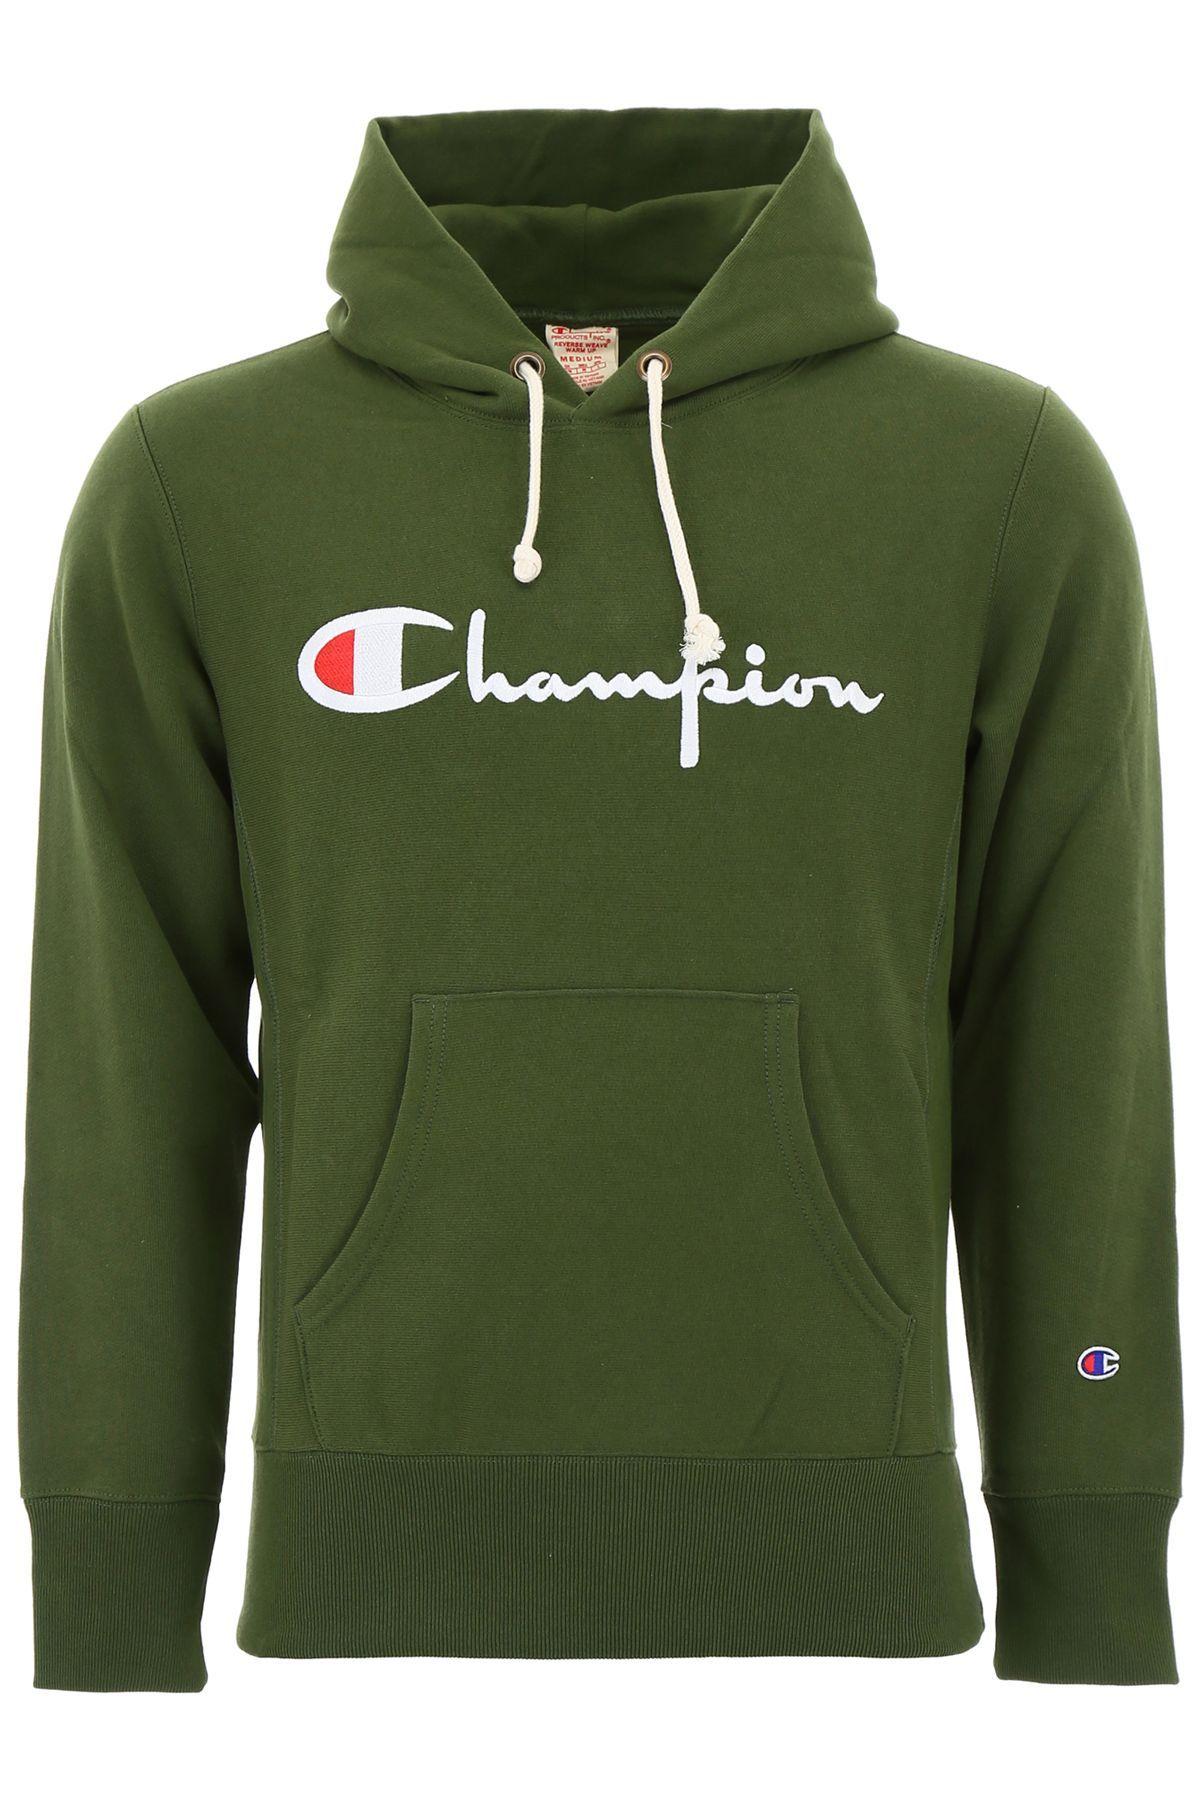 Champion Hoodie In Baf Modesens Champion Hoodie Hoodies Champion Clothing [ 1800 x 1200 Pixel ]